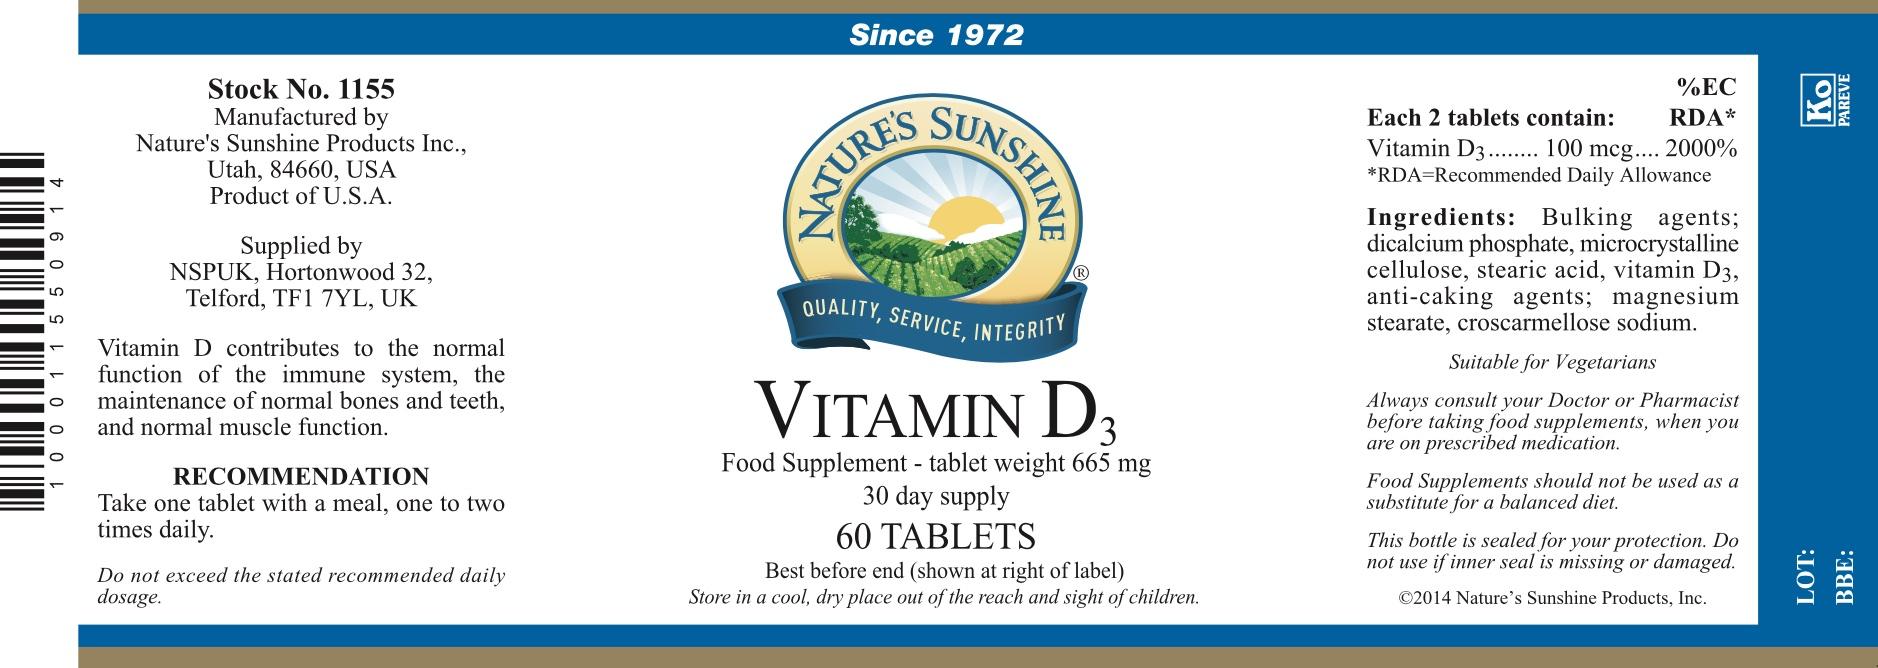 Nature's Sunshine Vitamin D3 Label